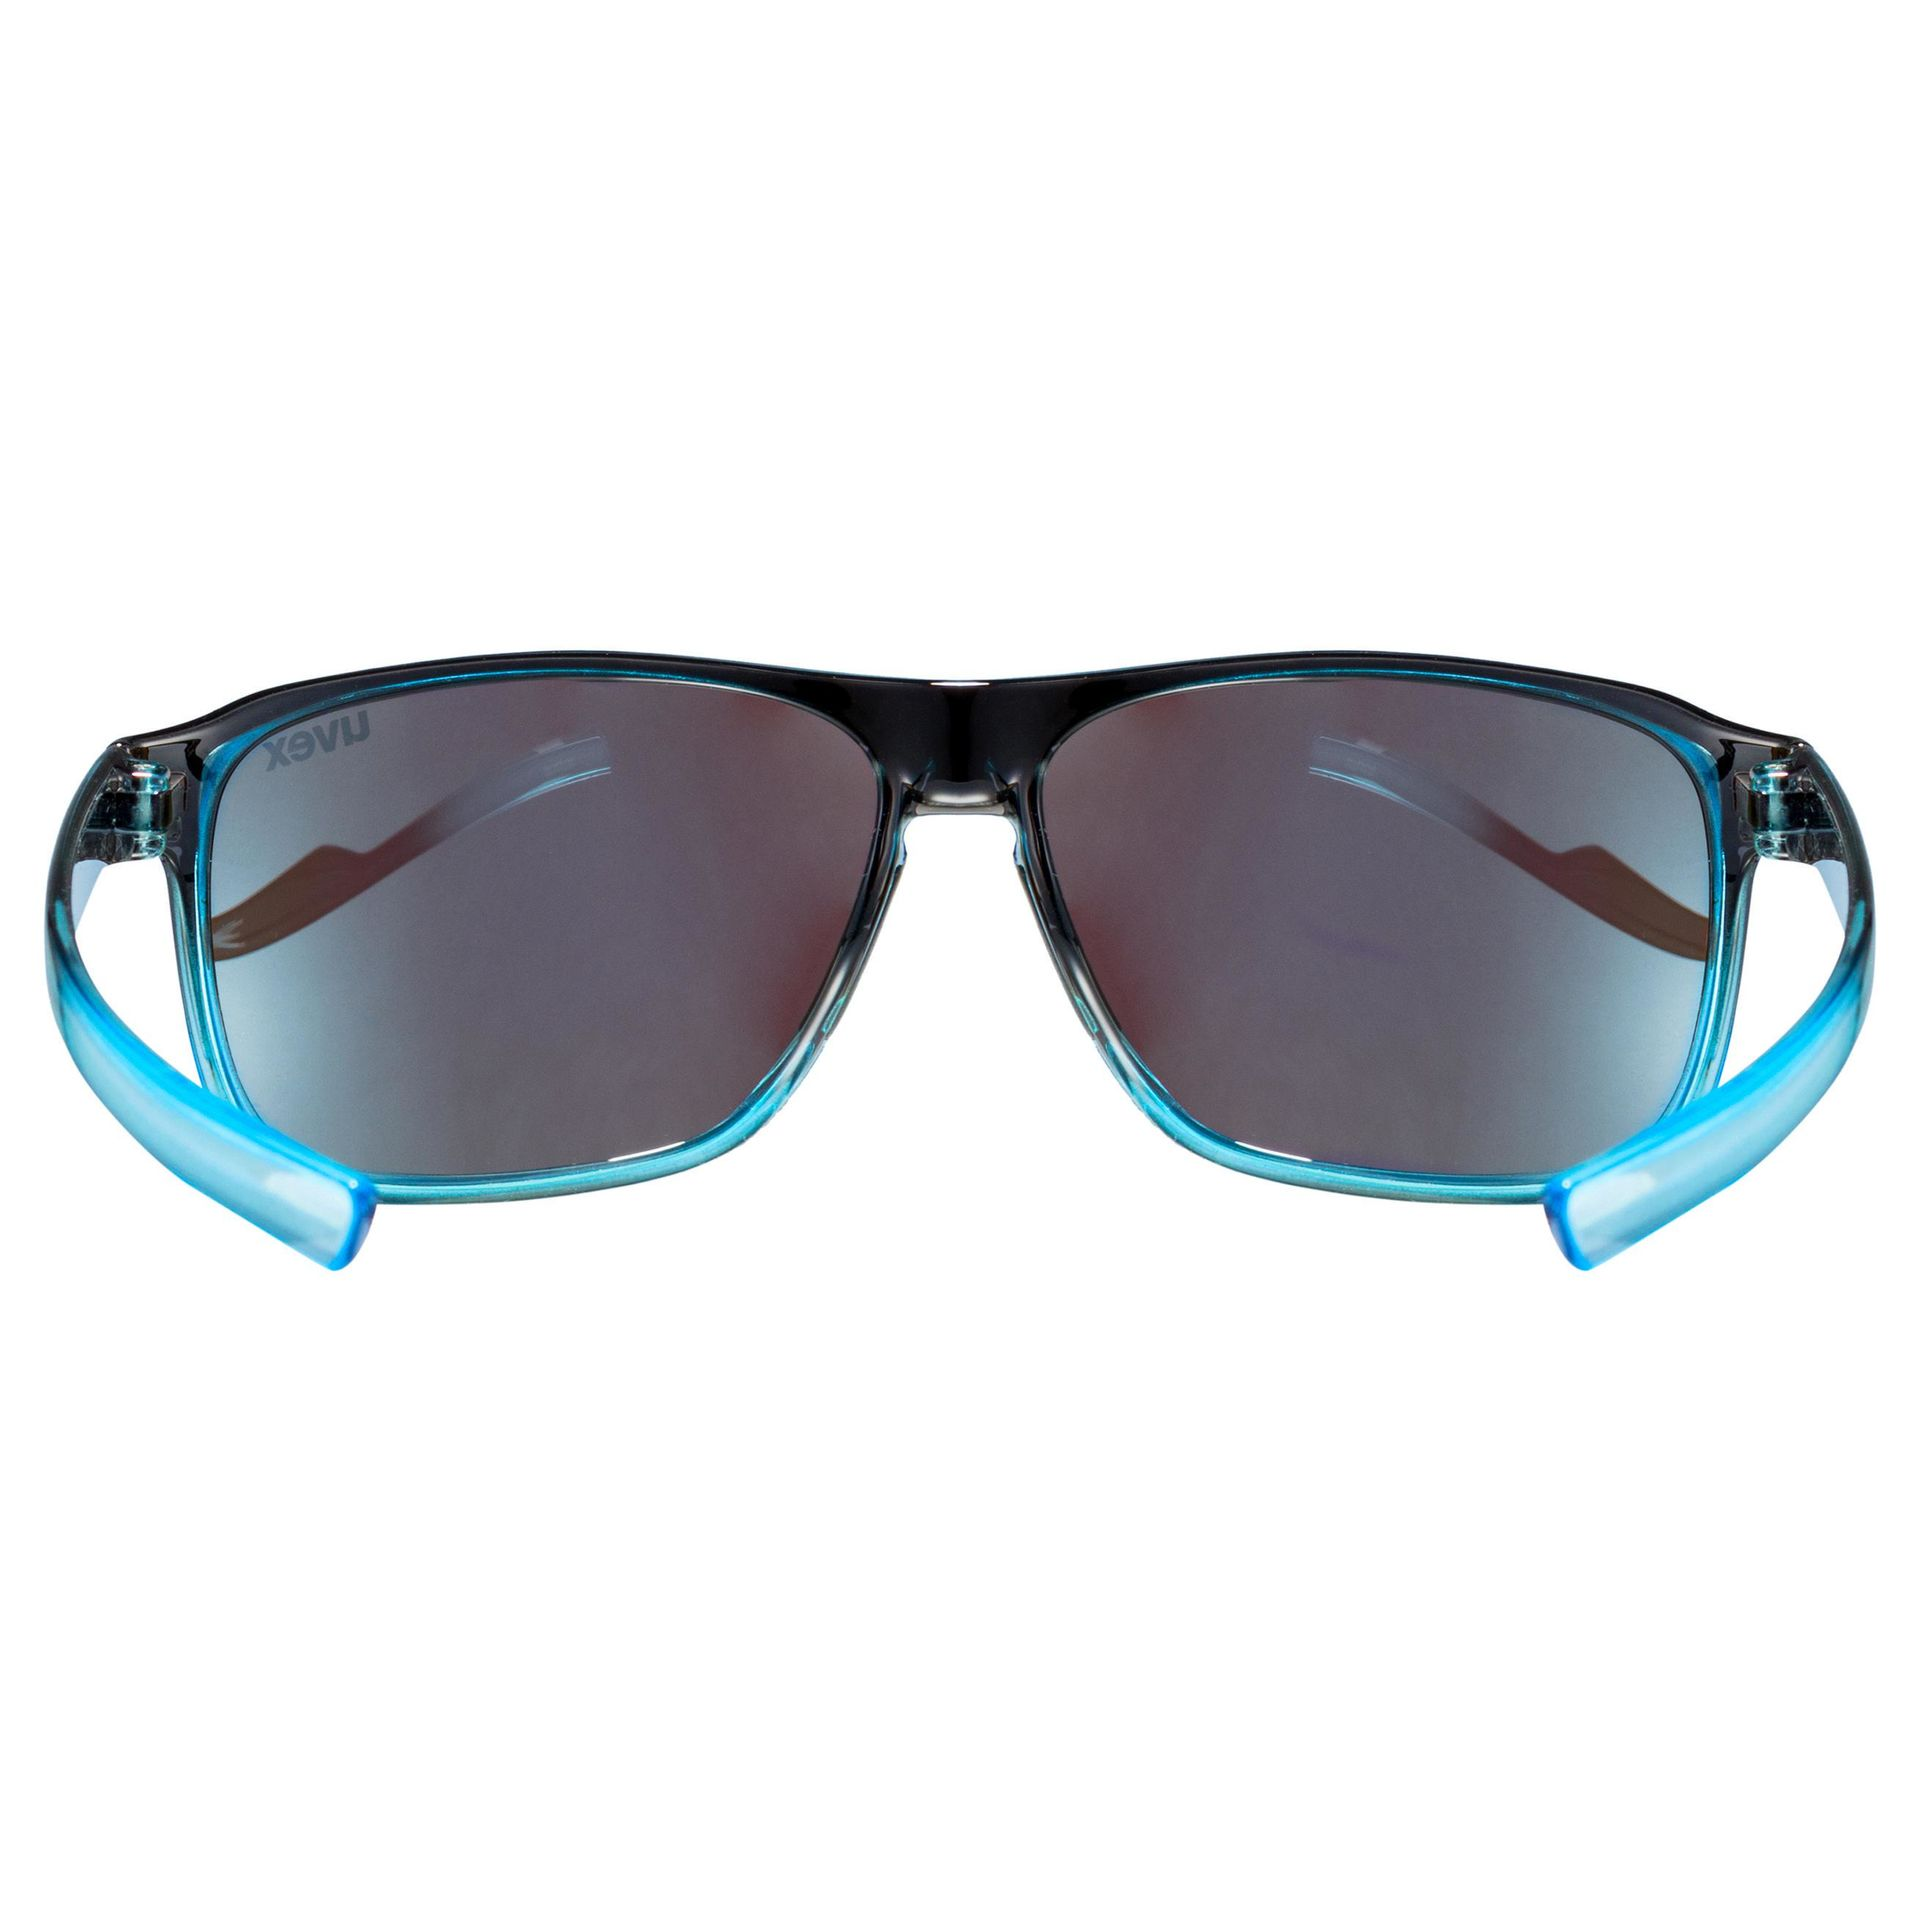 Sonnenbrille Uvex Lifestyle lgl 33 pola schwarz blau NEU